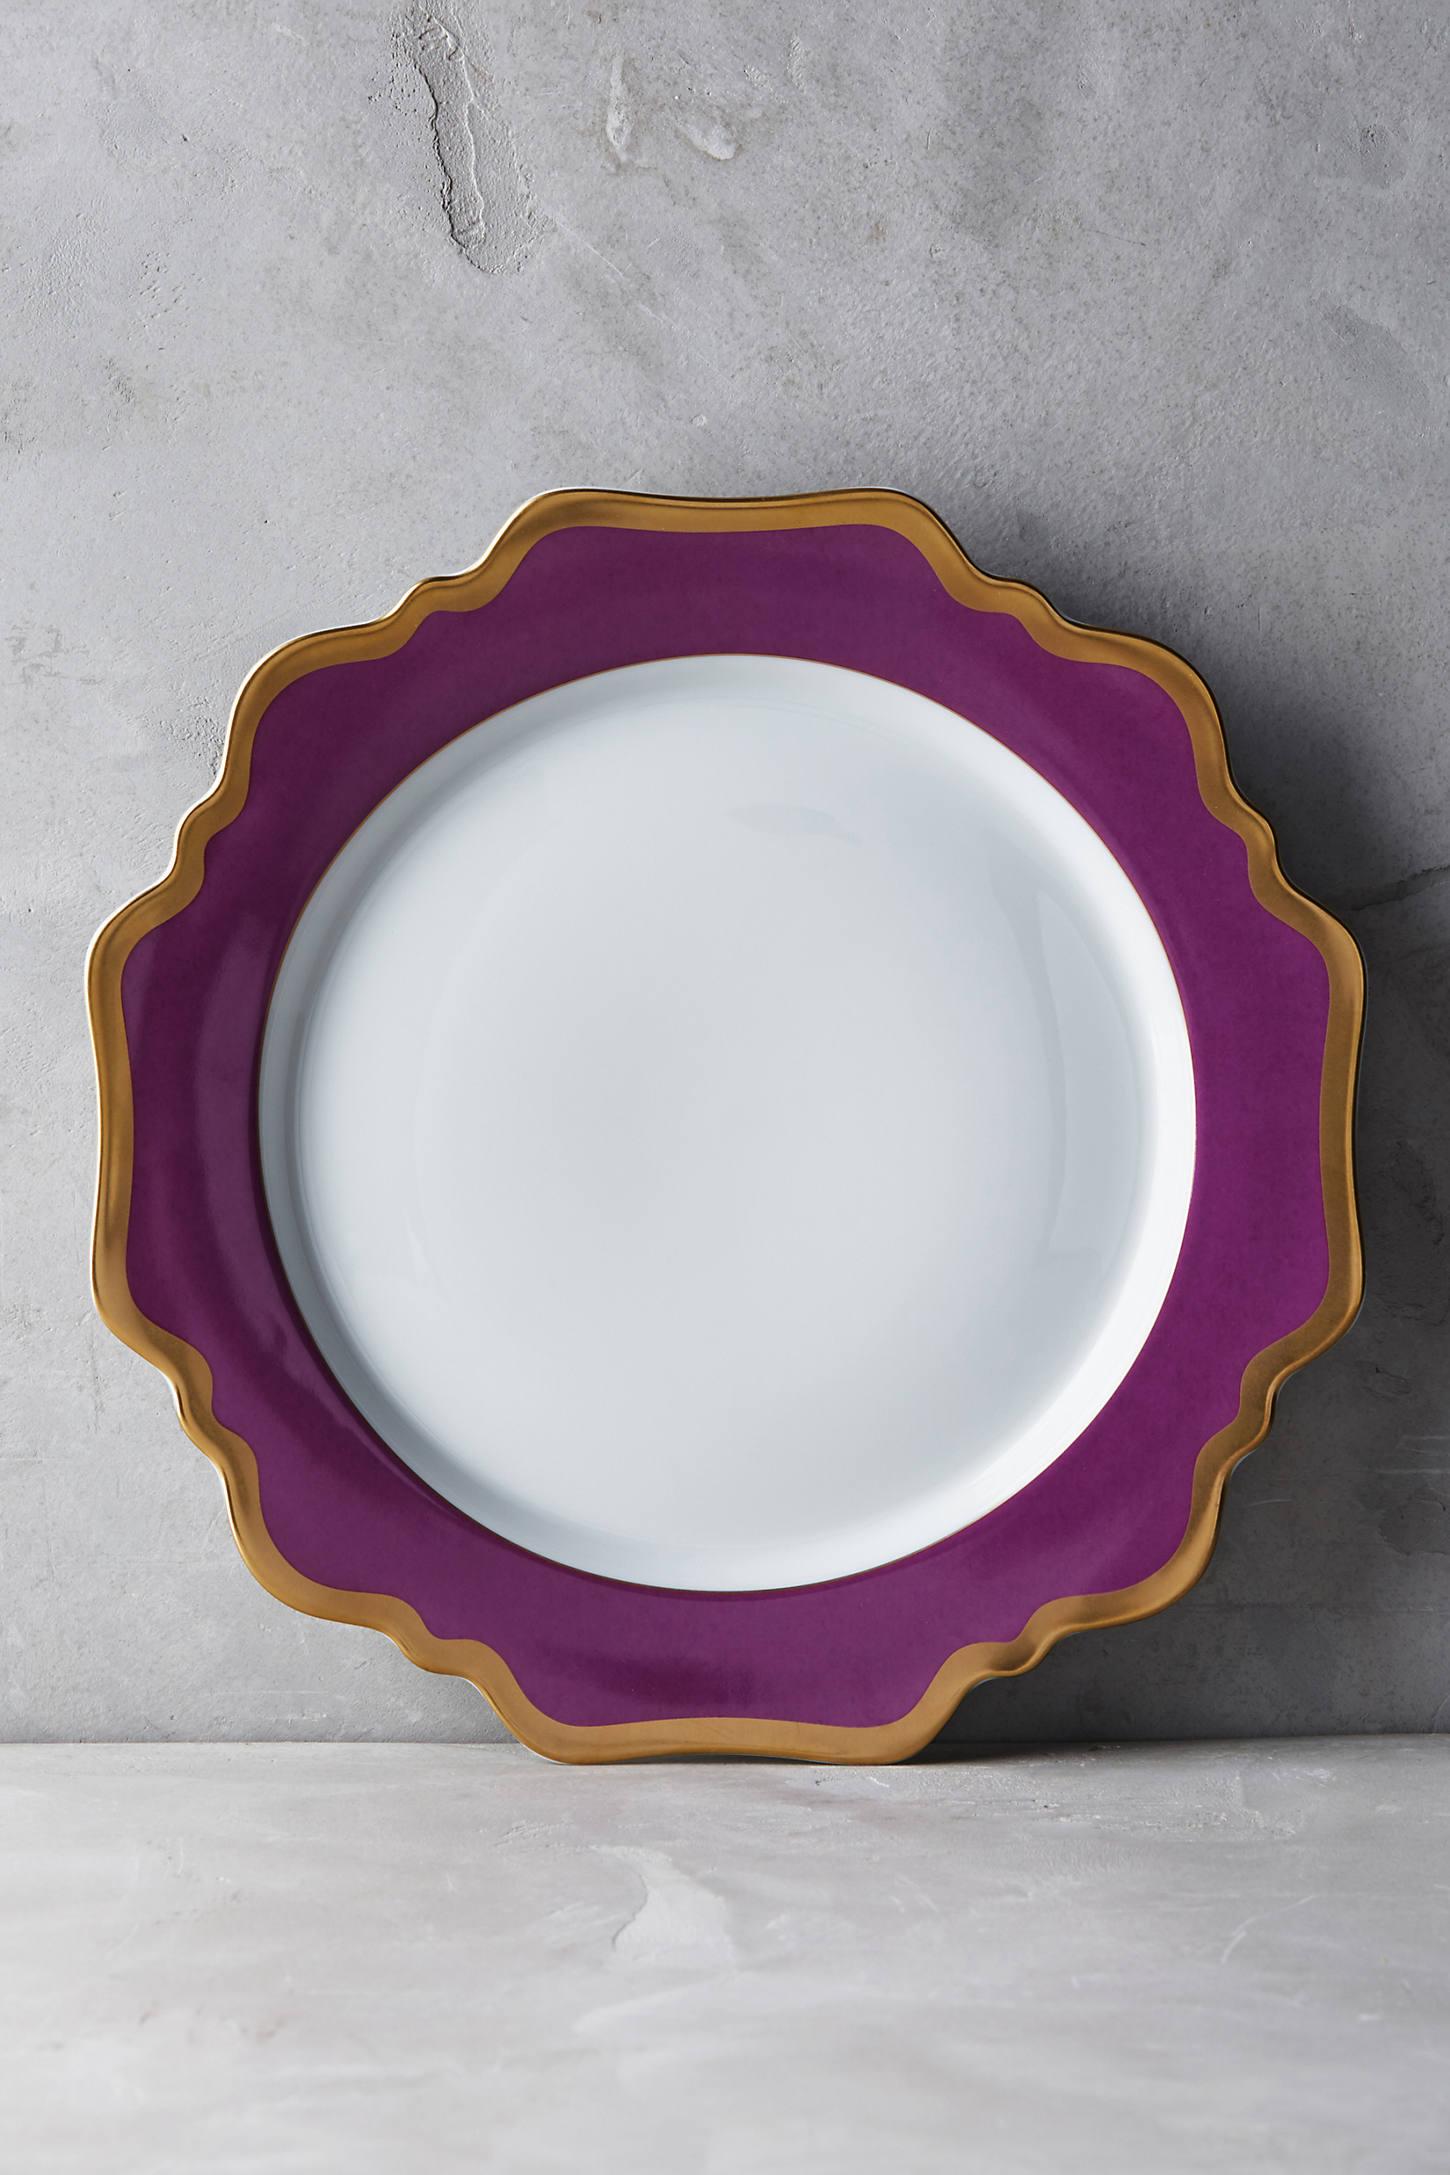 Anna's Palette Purple Orchid Dinner Plate